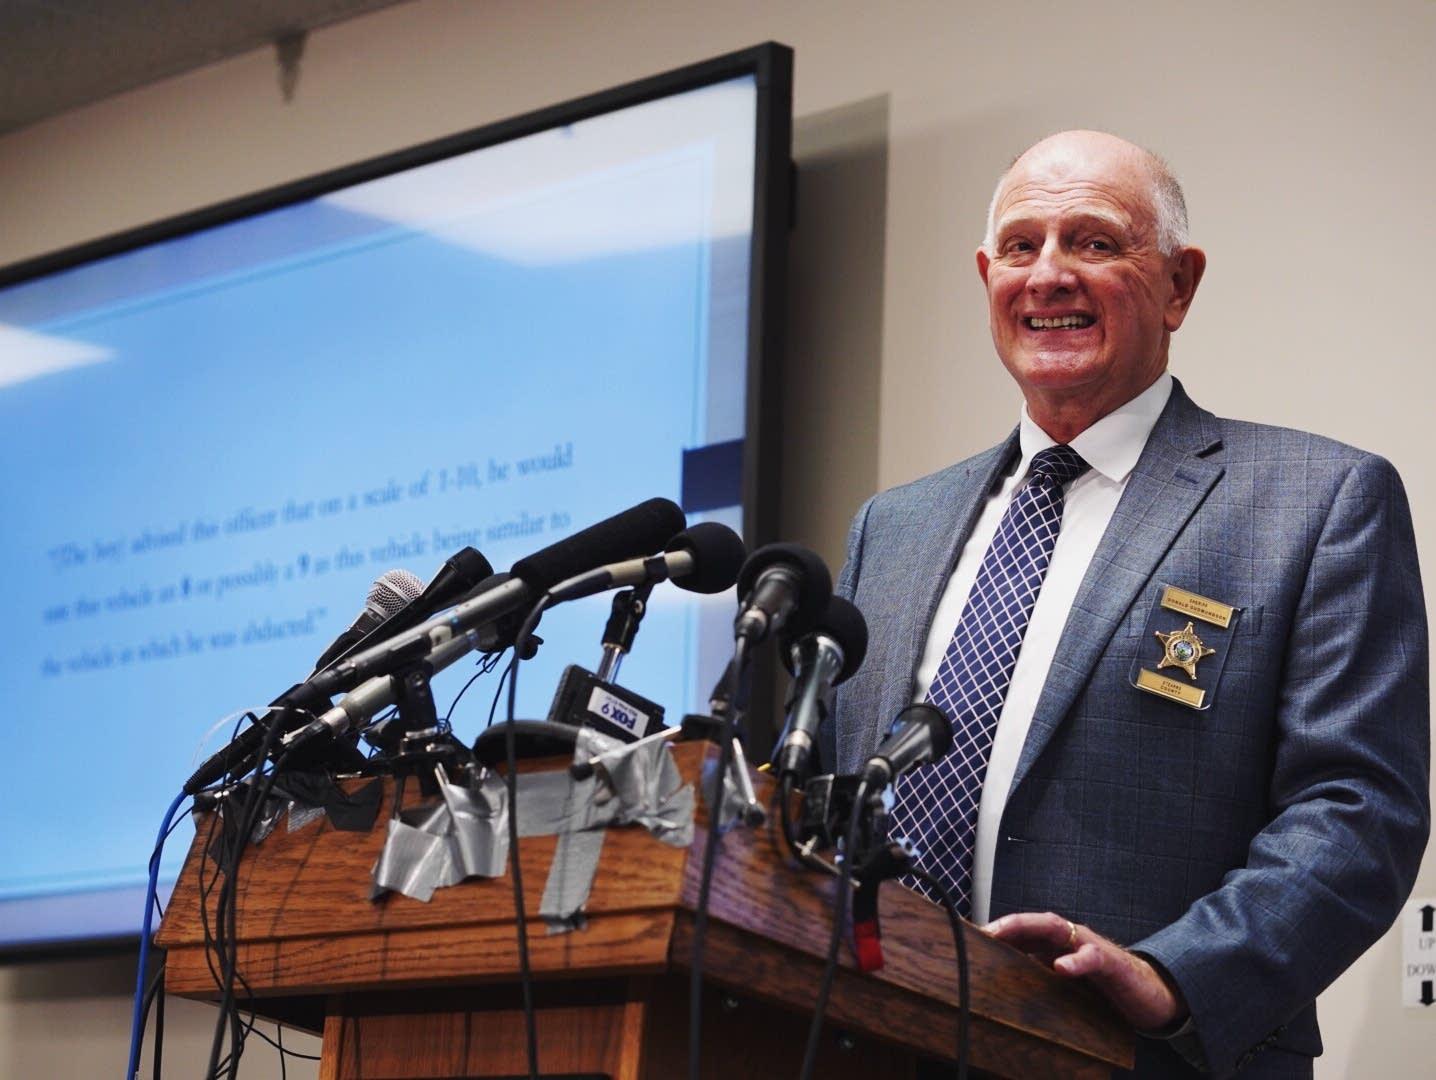 Stearns County Sheriff Donald Gudmundson